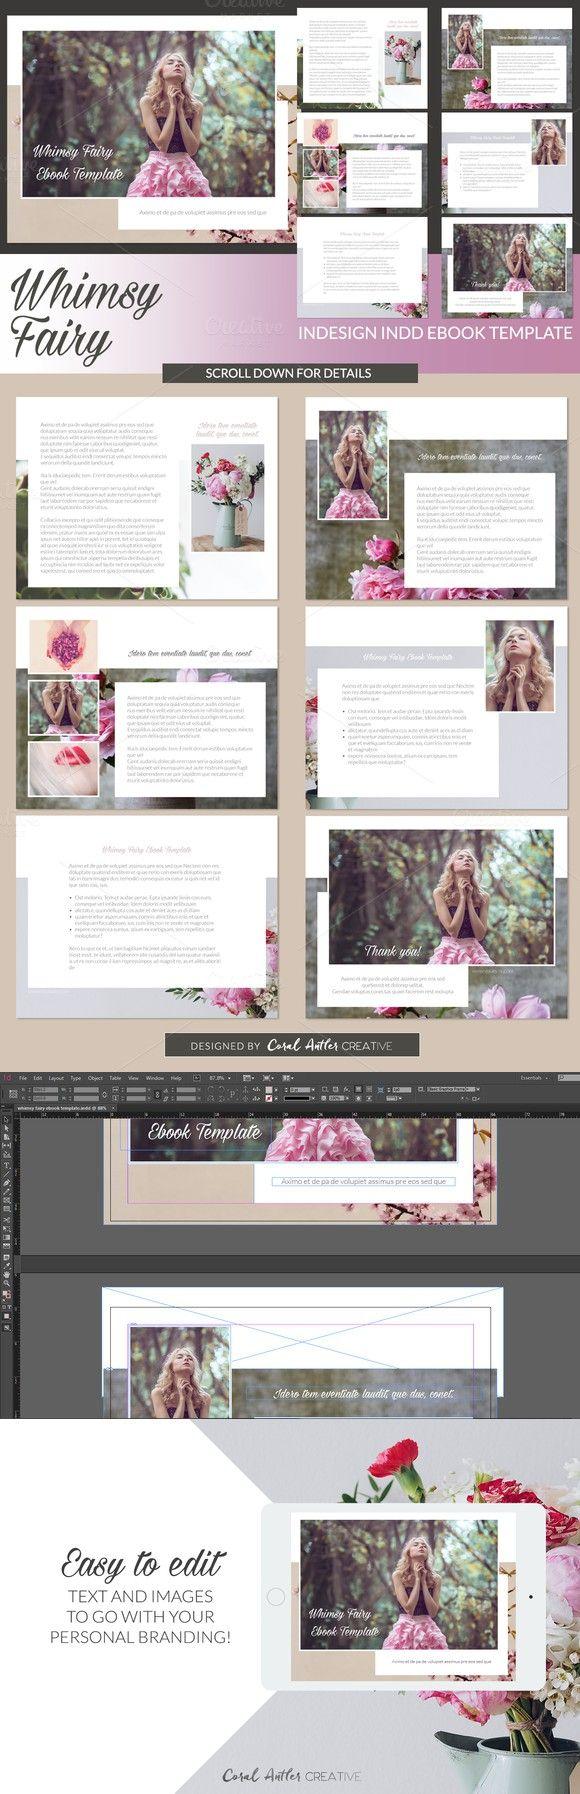 1275 mejores imágenes de Presentation Templates en Pinterest ...